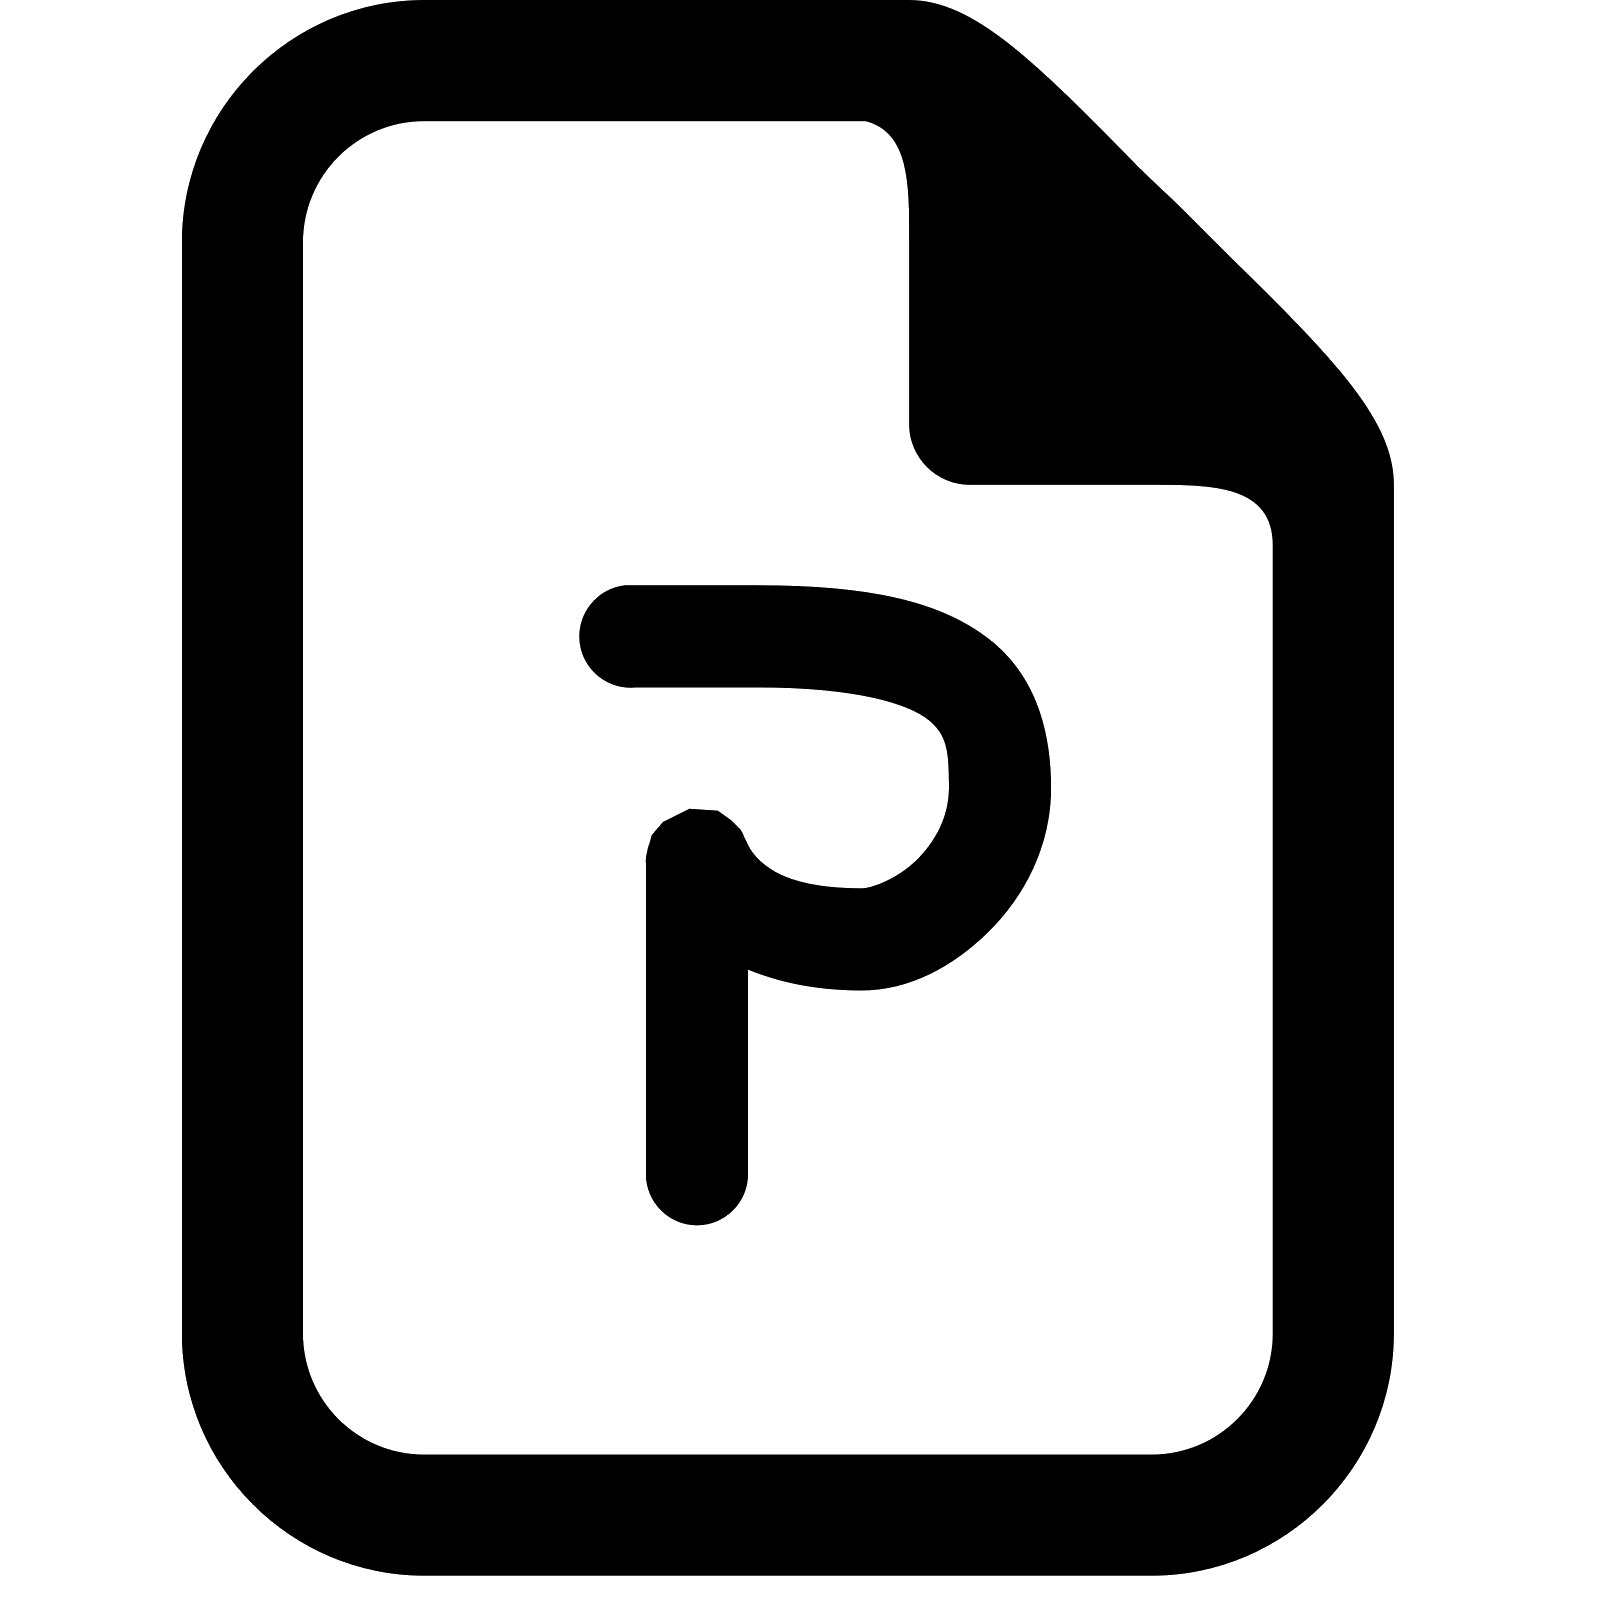 1600x1600 Powerpoint Icon